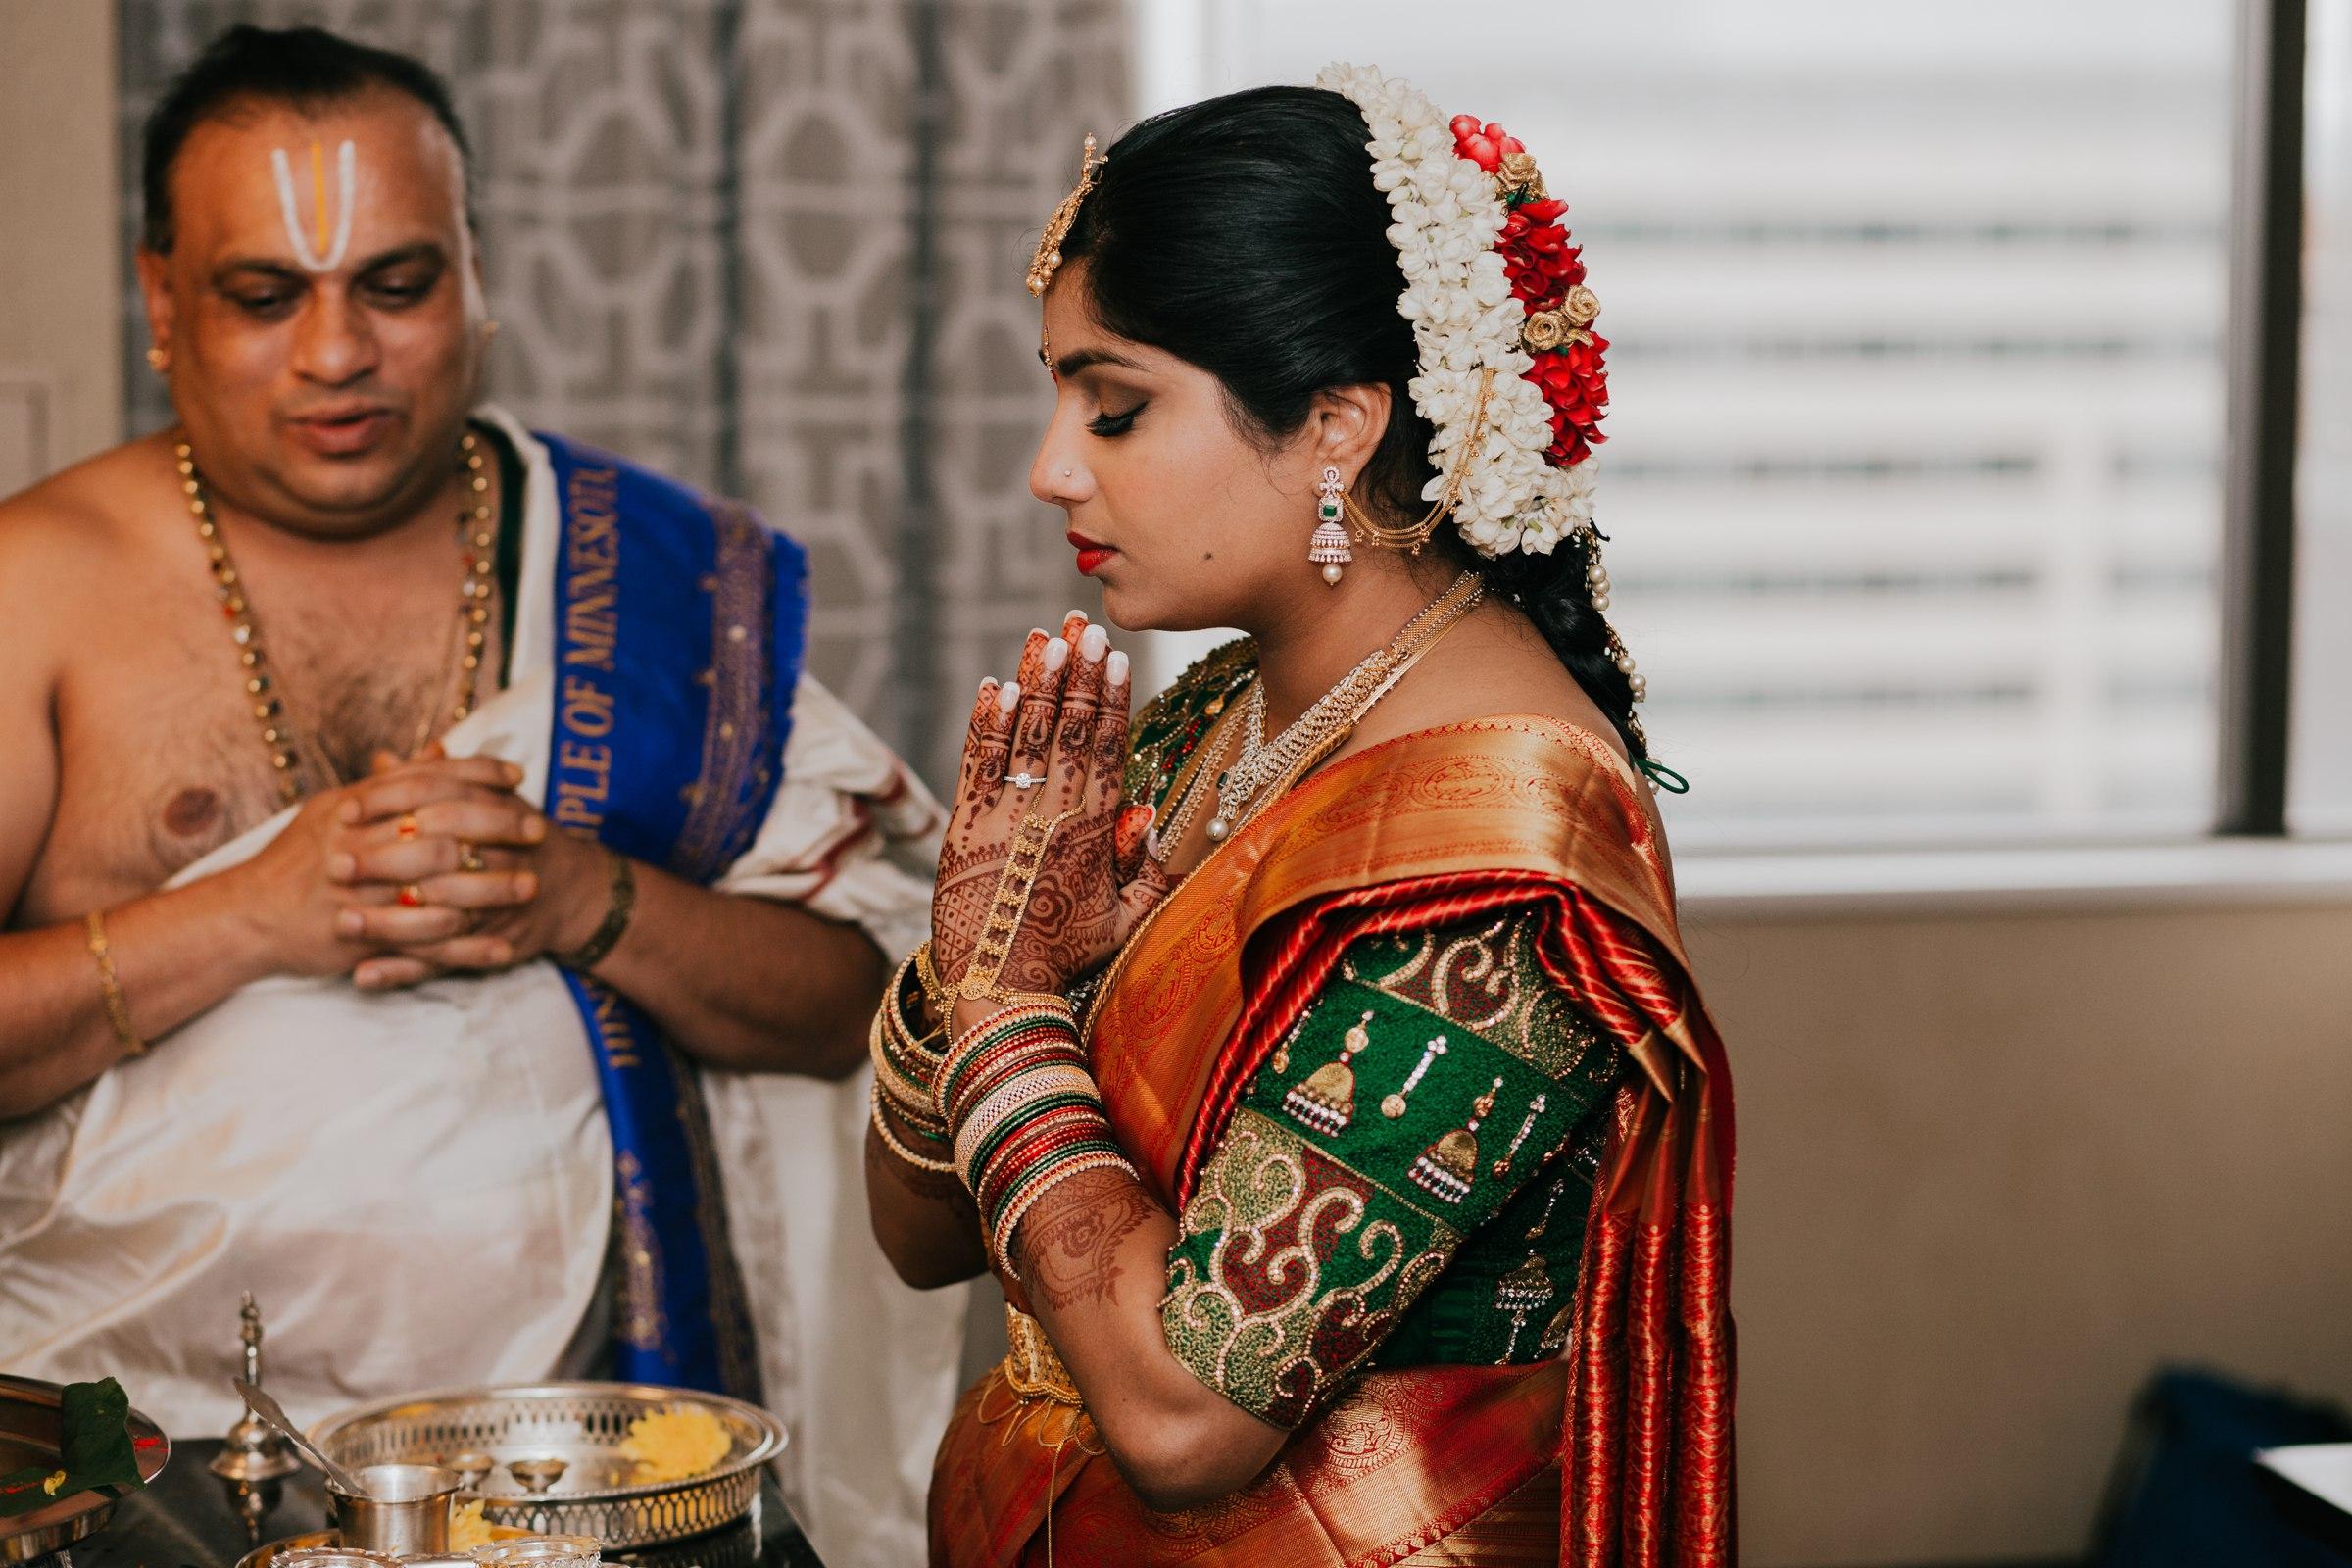 indian wedding minneapolis minnesota texas austin wedding elopement destination intimate best photographer_0005.jpg